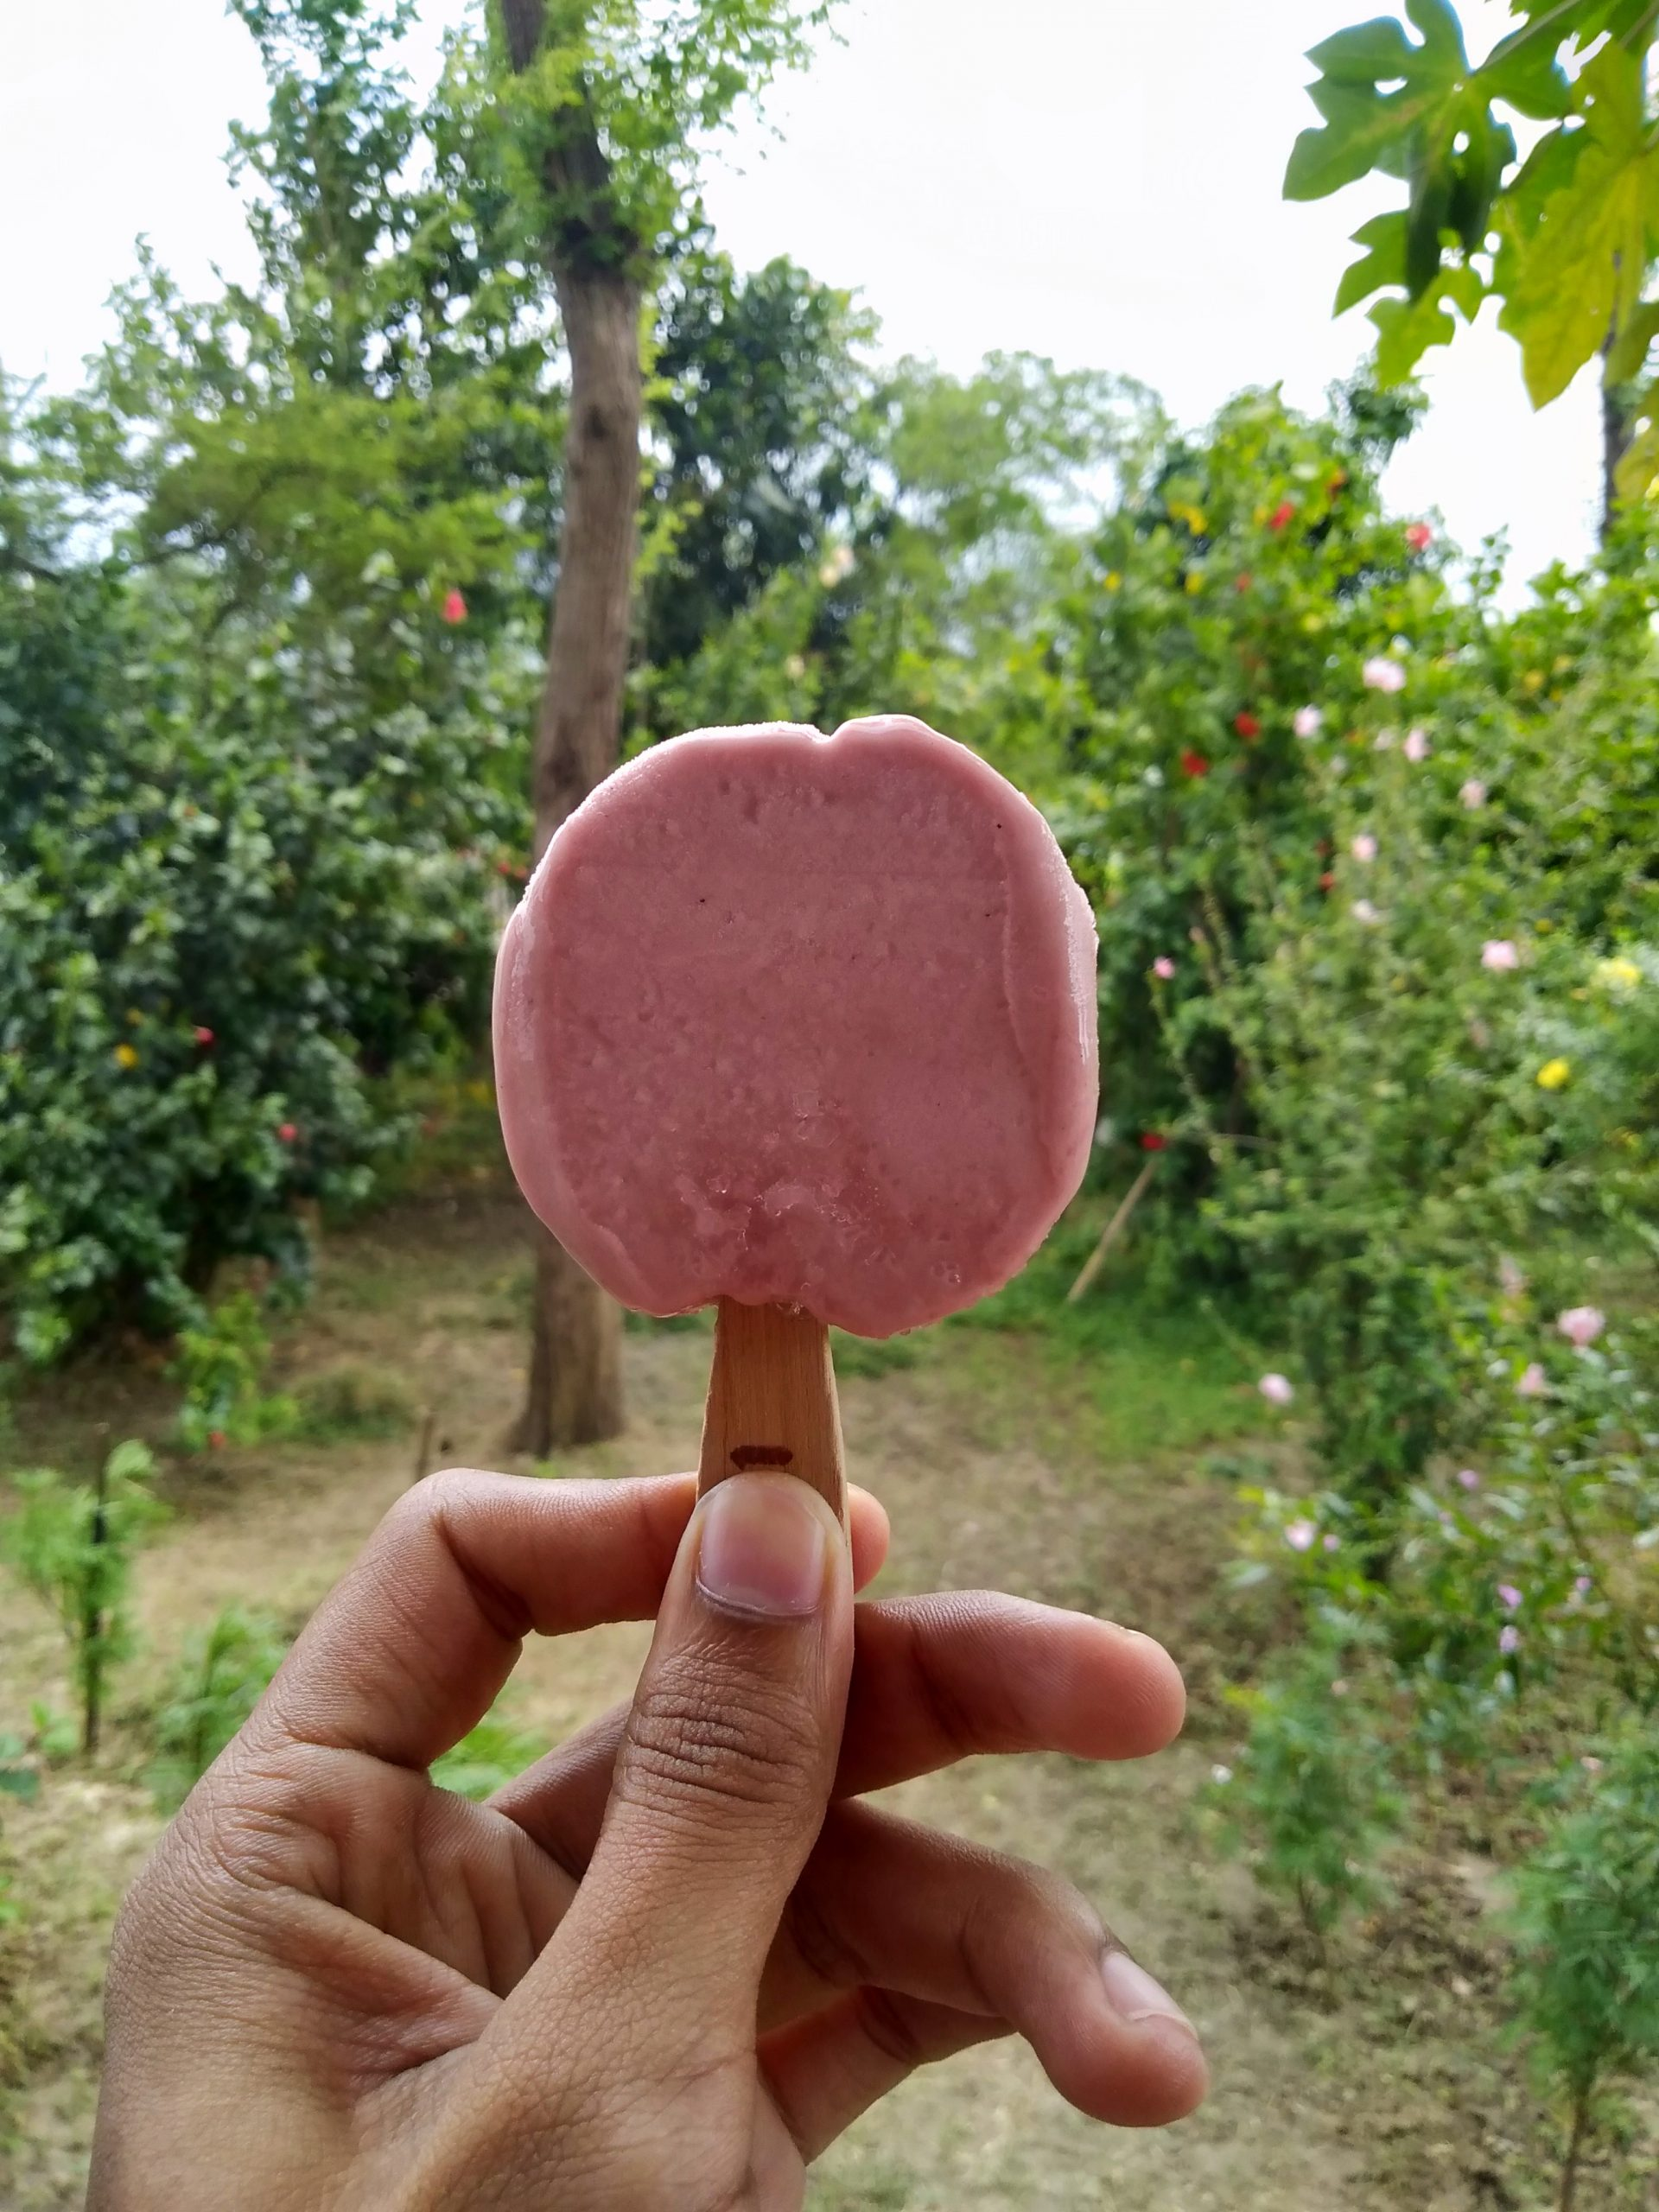 Ice cream pop in hand